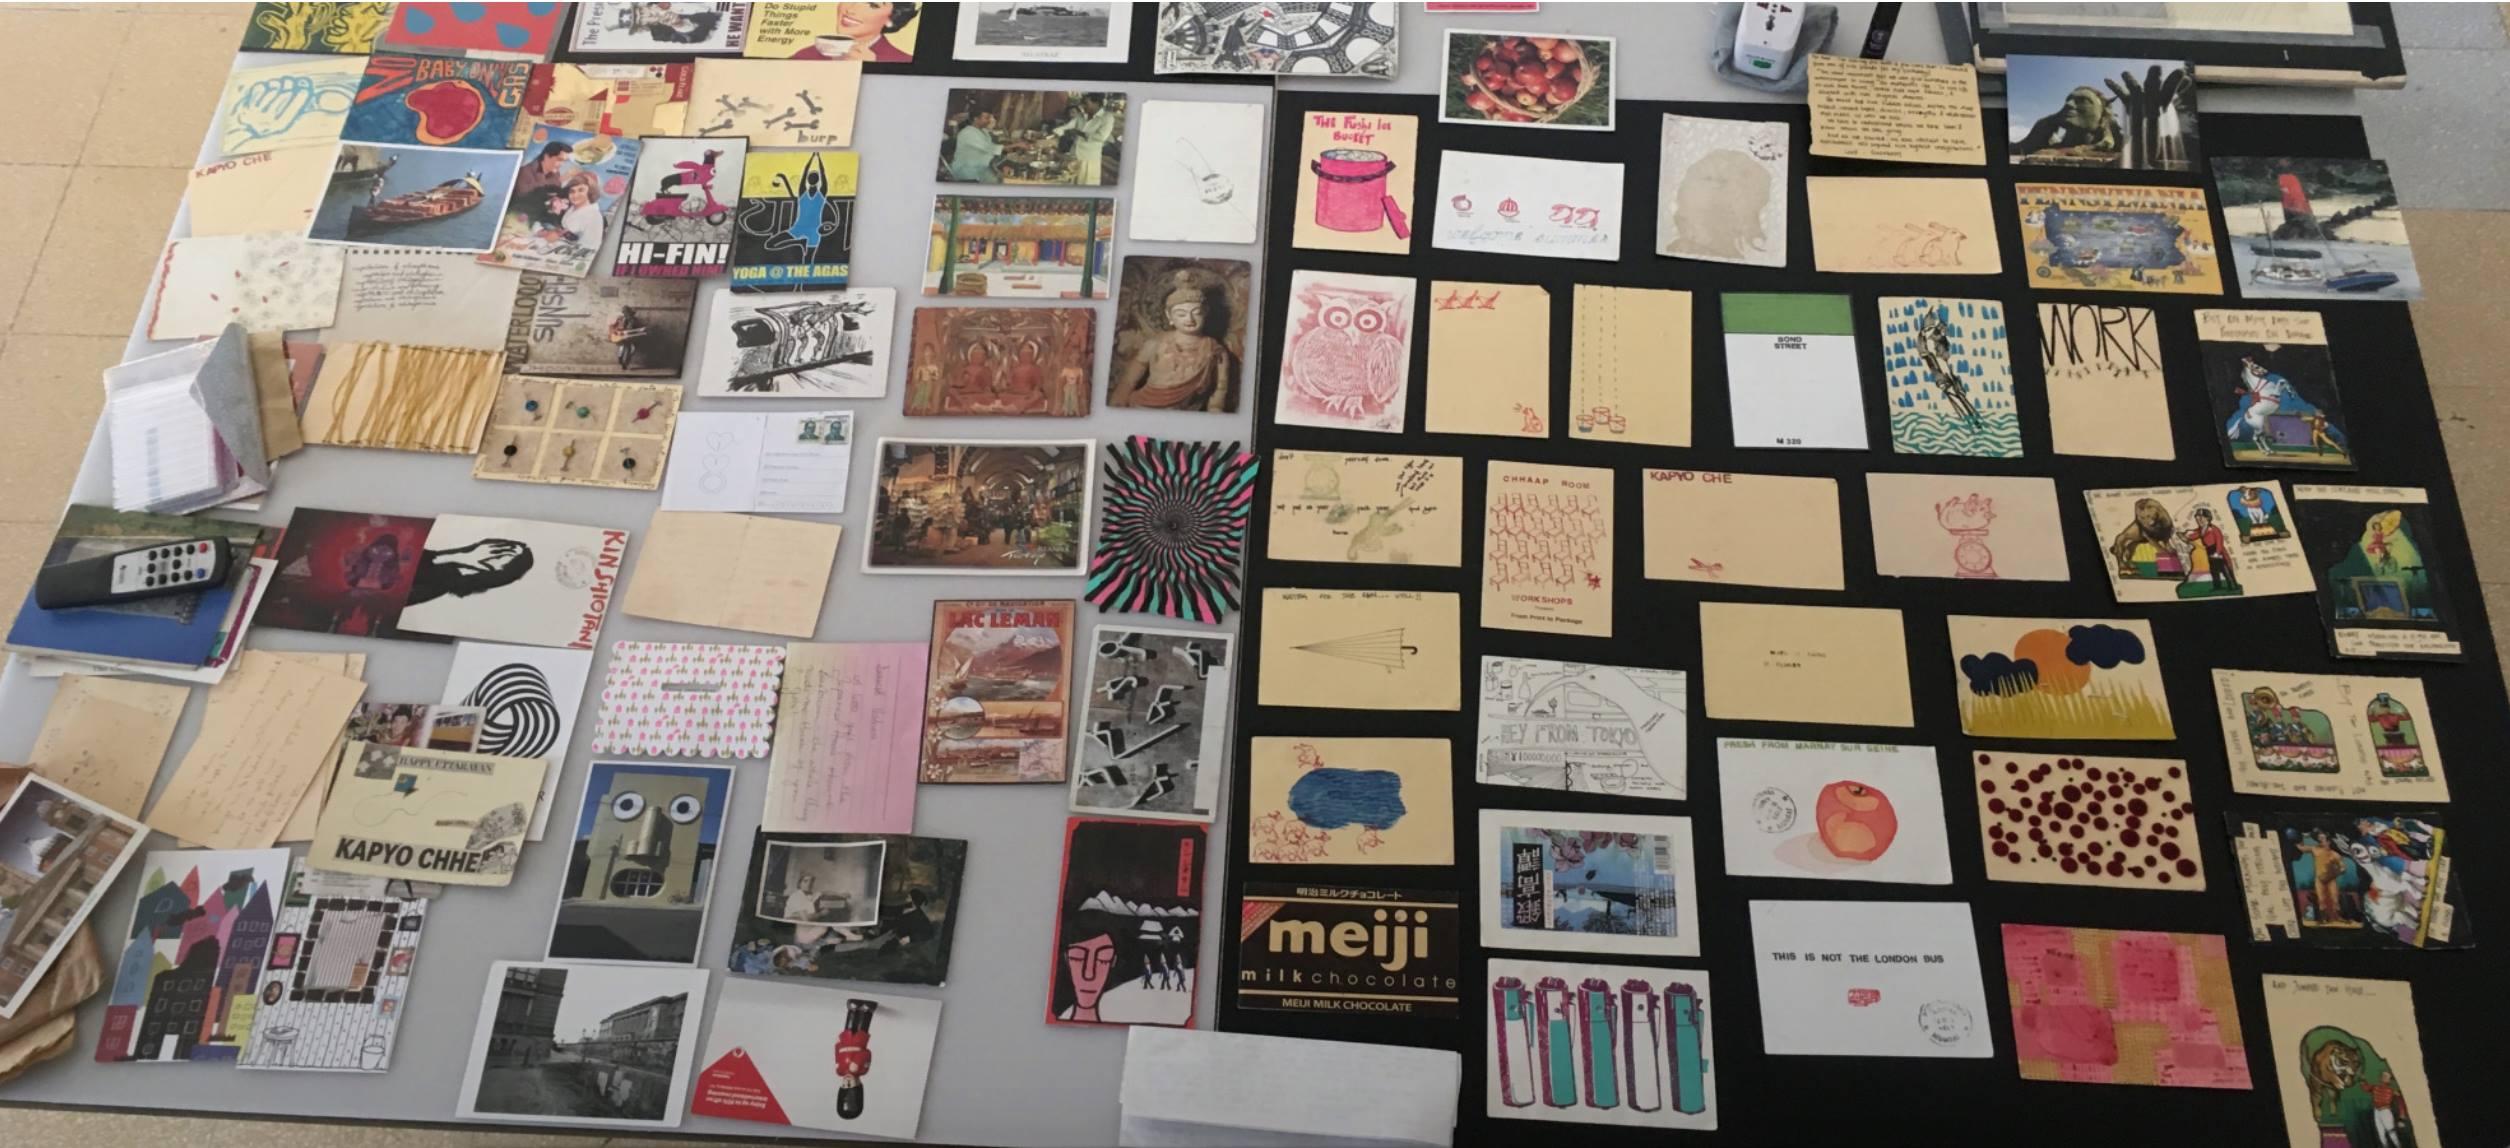 SqW:Lab Open Studio